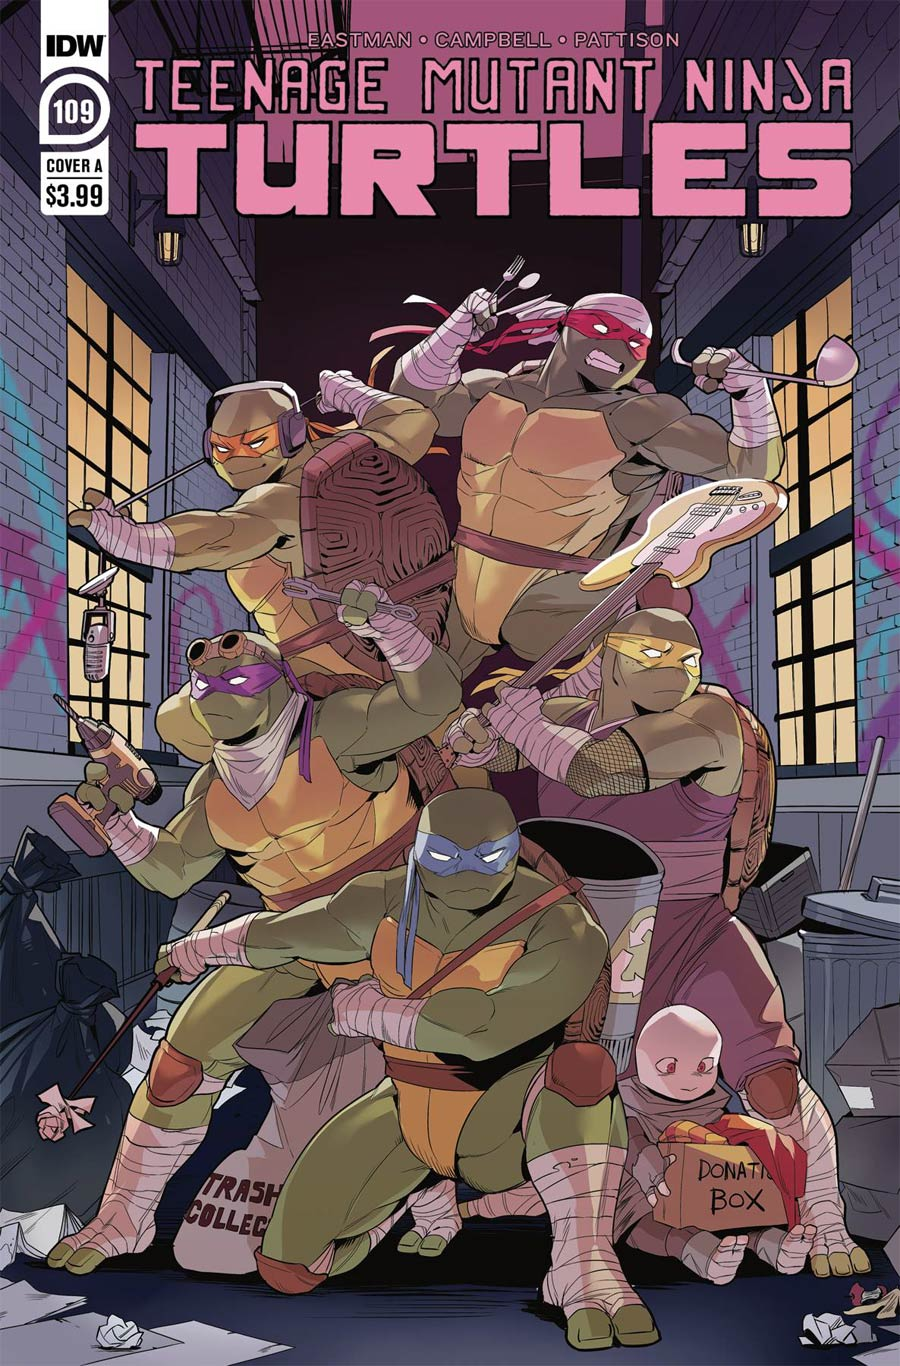 Teenage Mutant Ninja Turtles Vol 5 #109 Cover A Regular Jodi Nishijima Cover